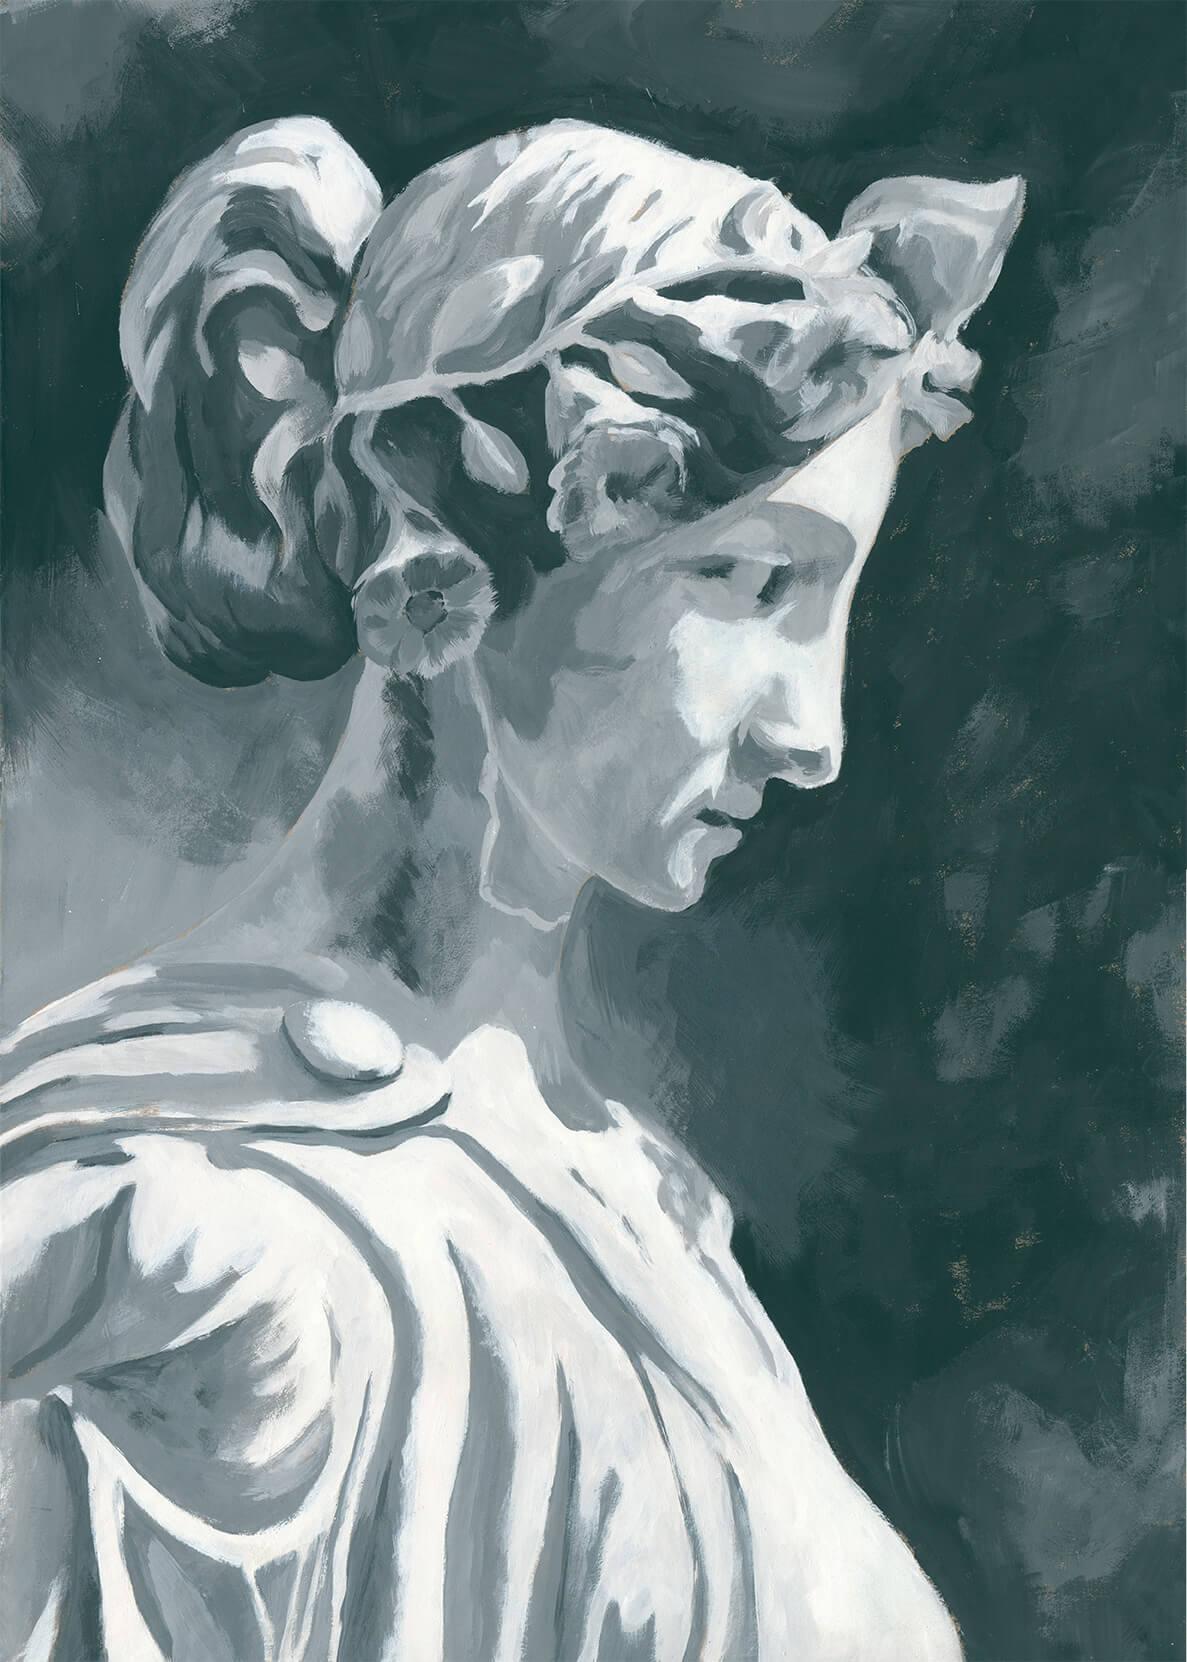 Skulptur, Büste, Griechische Skulptur, fleckhaft, Tempera